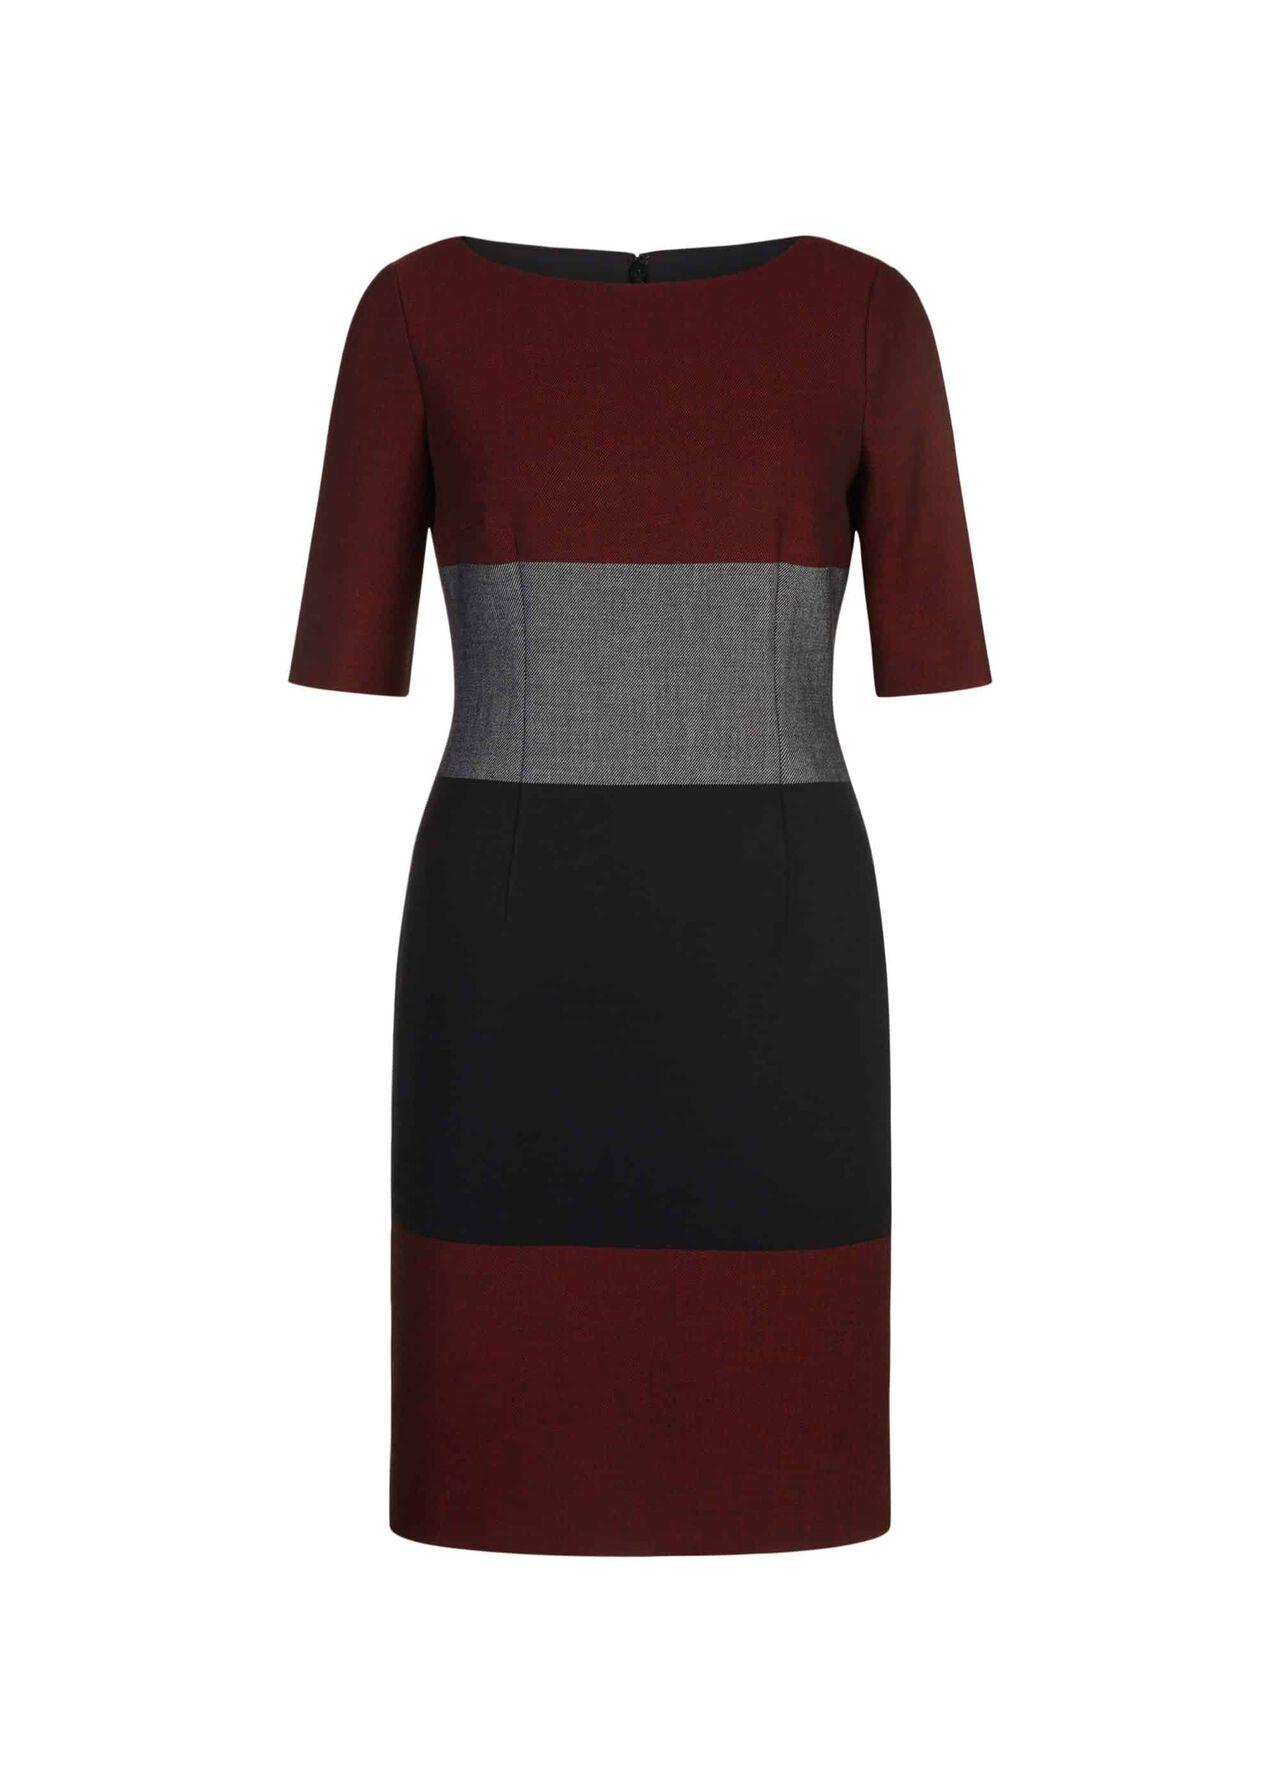 Jemima Dress Navy Red Ivory